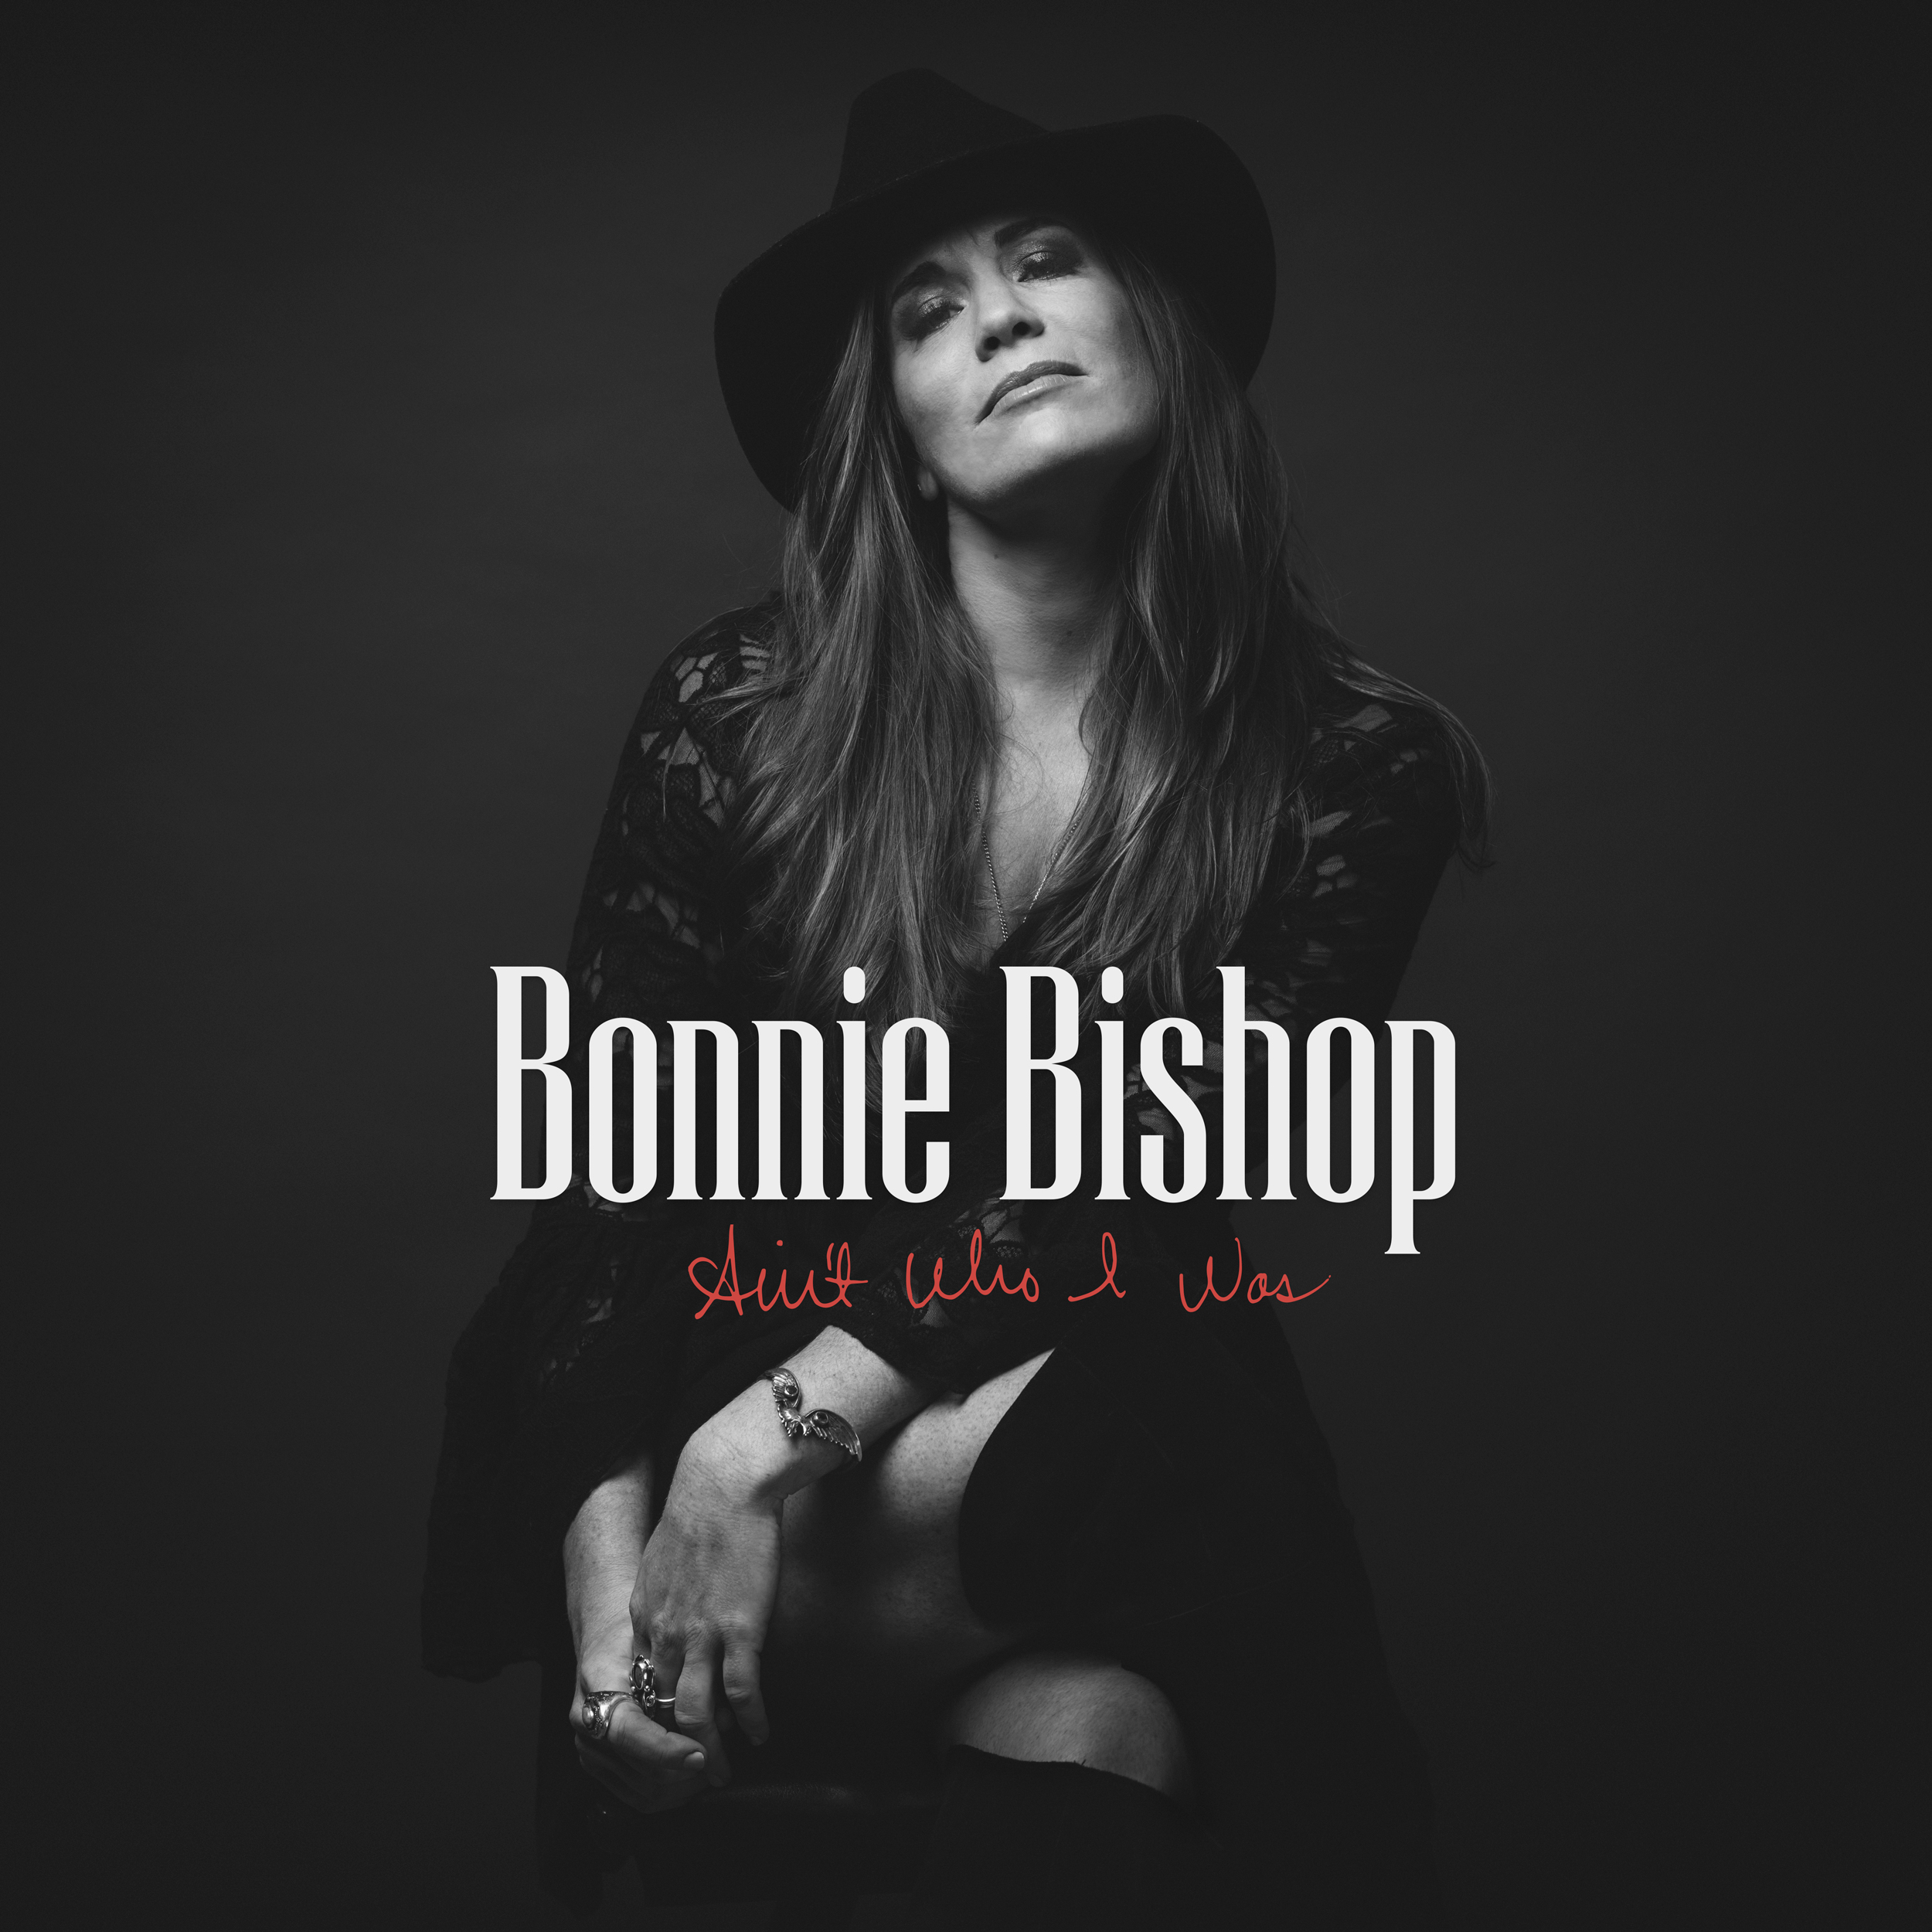 Boninie Bishop Album cover.jpg